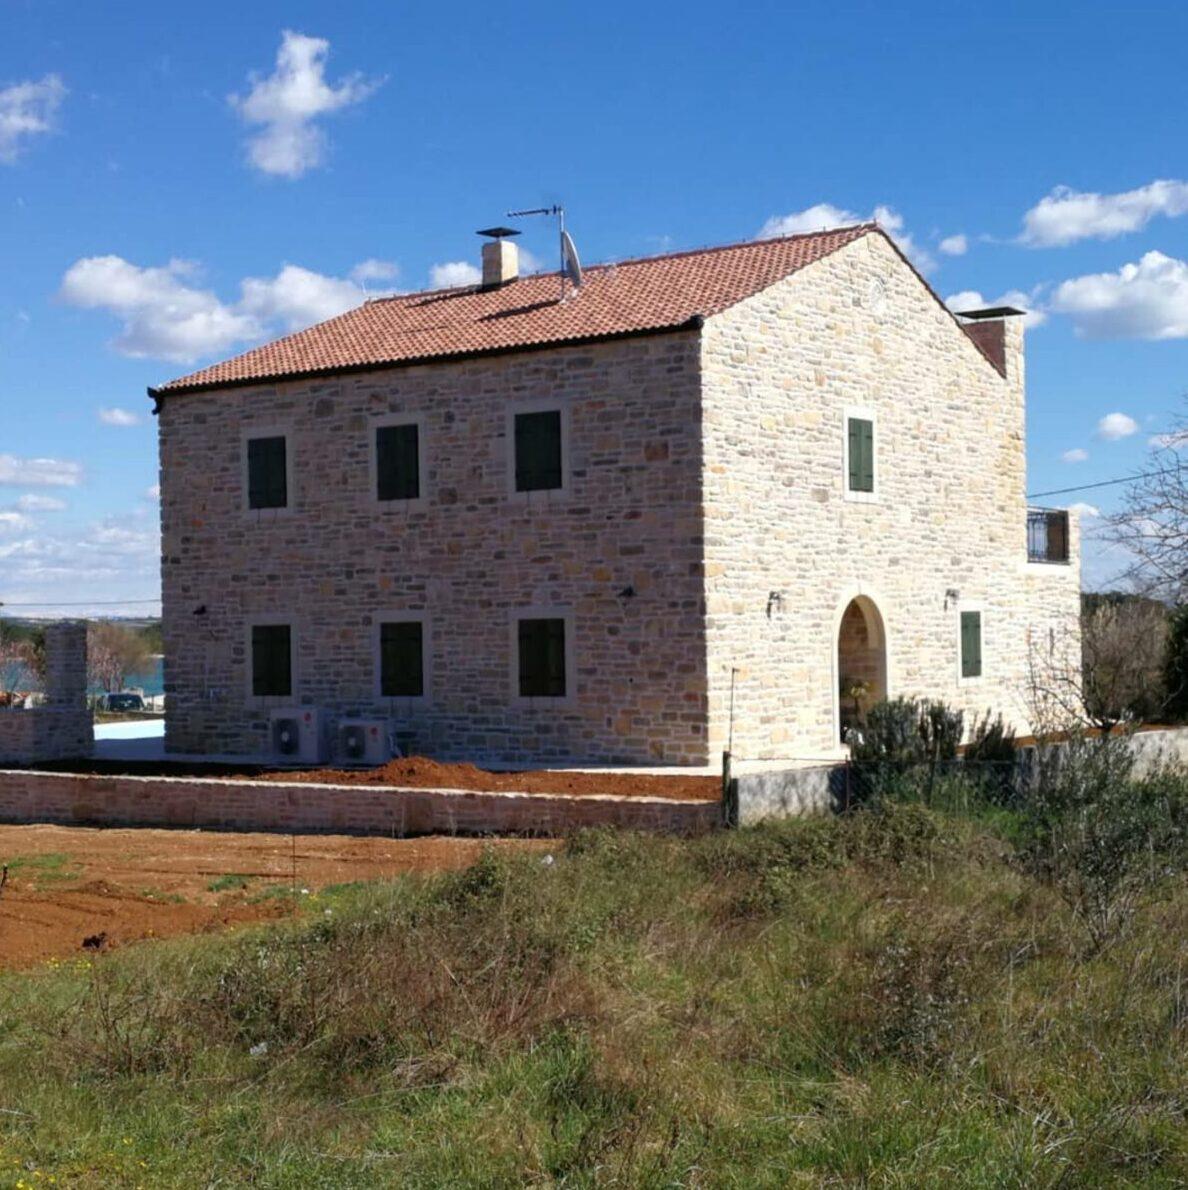 arhitektura knez kamena kuća uz more